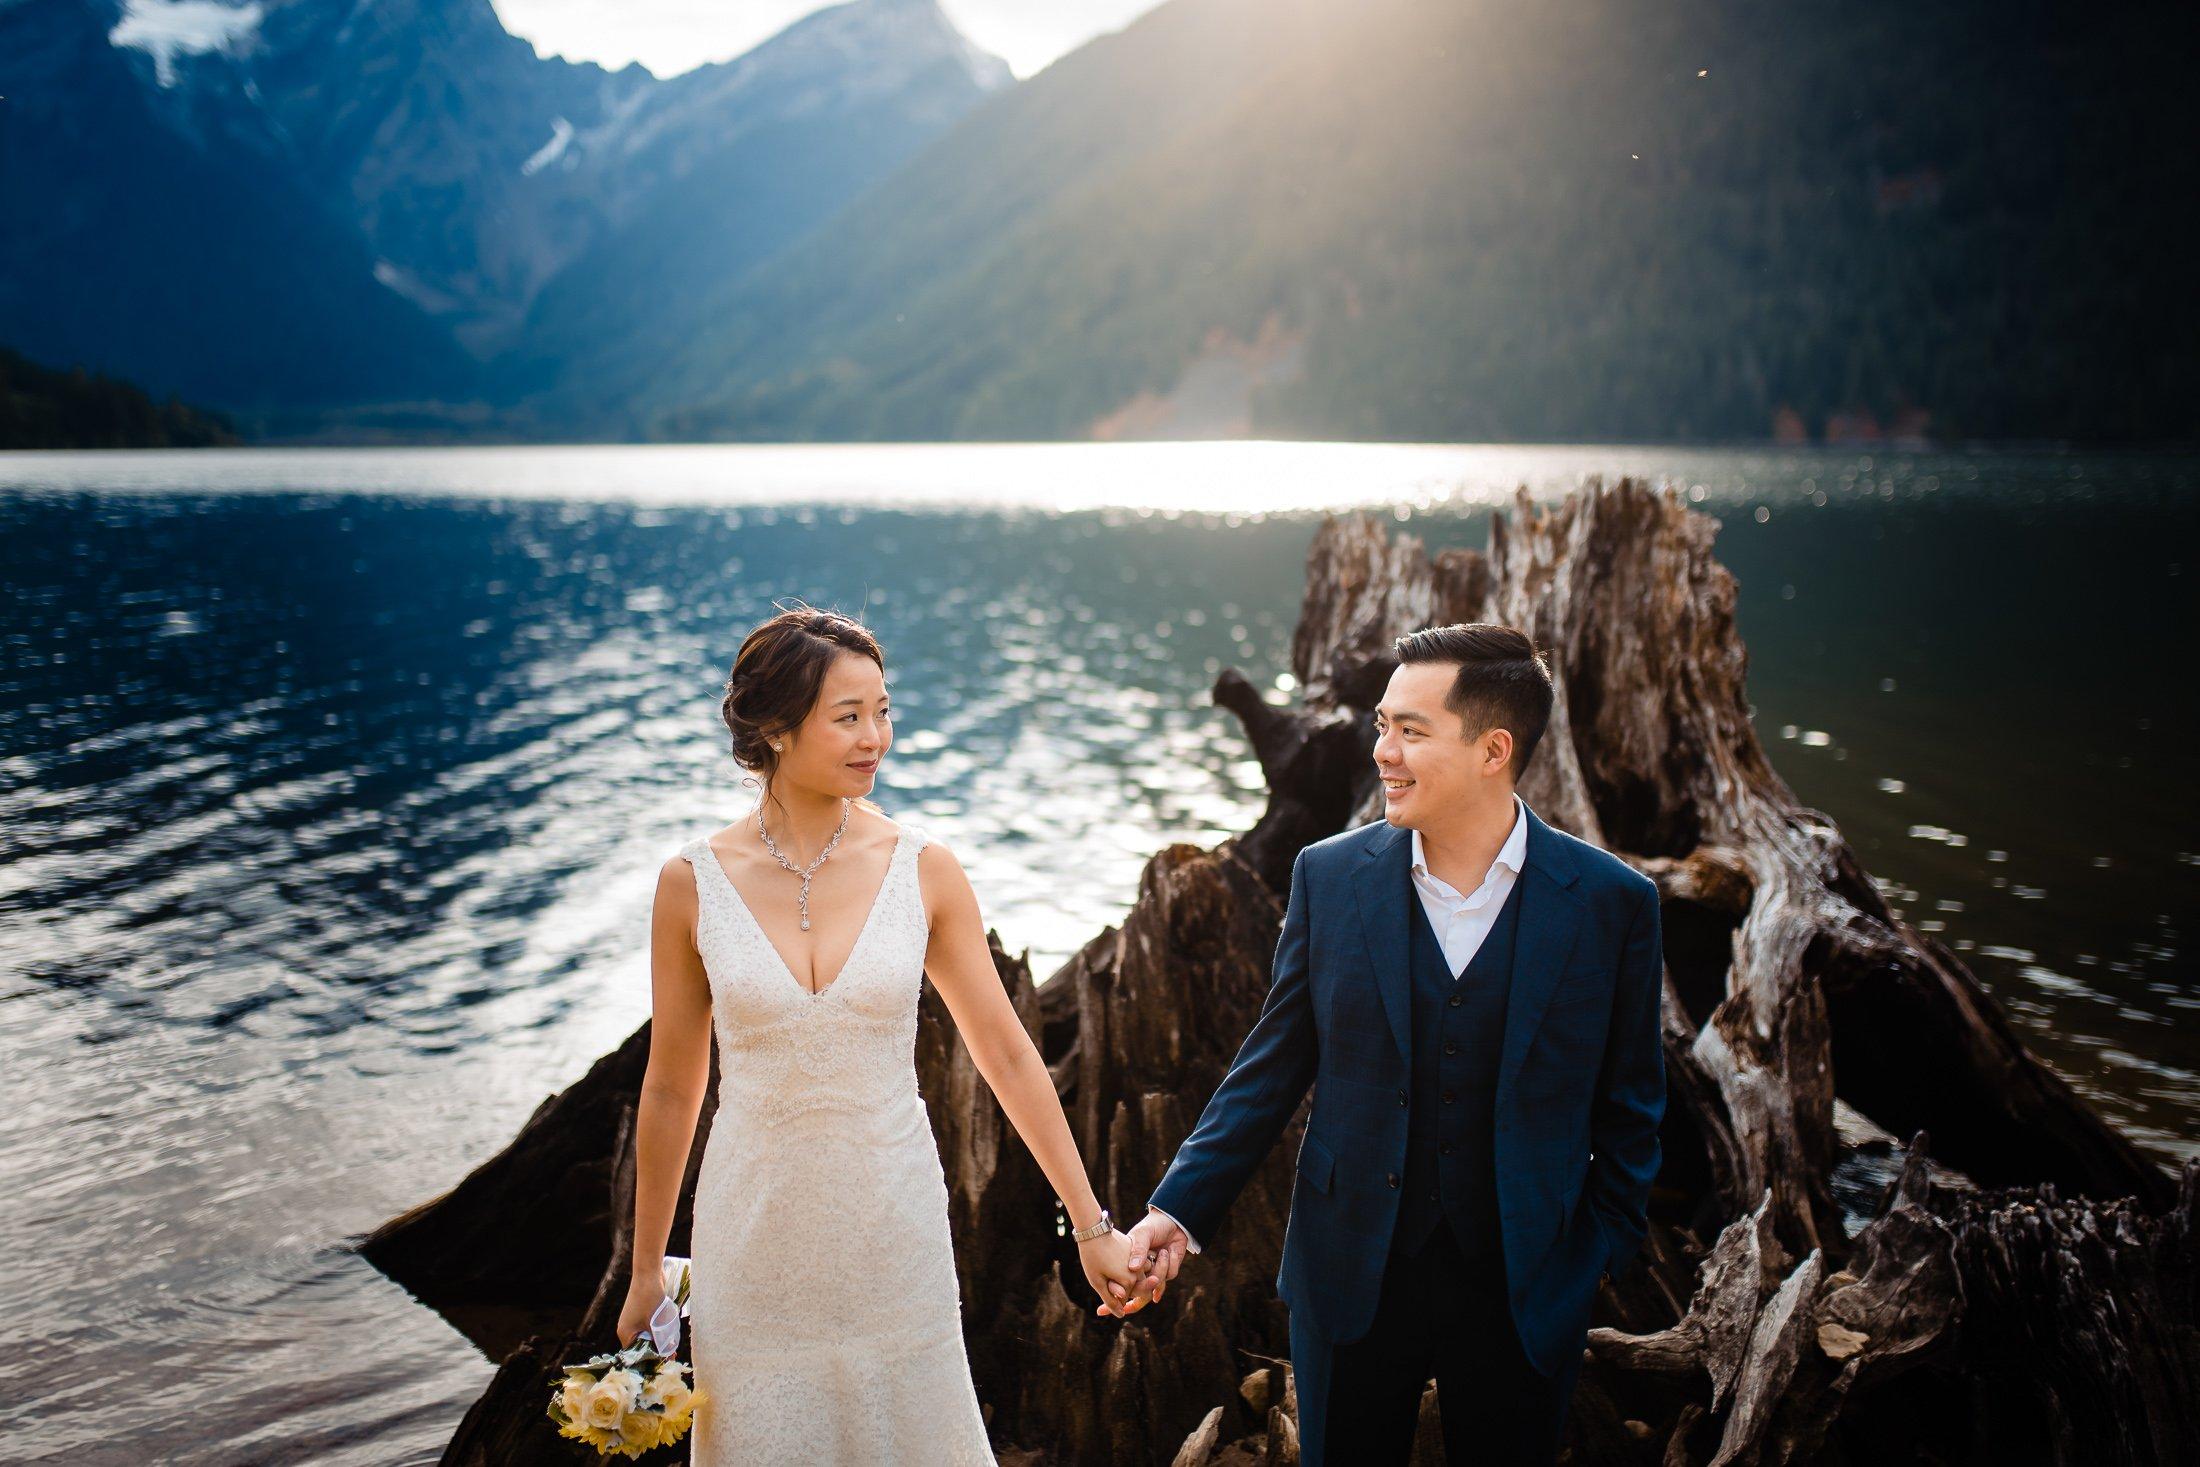 013 - pnw adventure elopement photographers